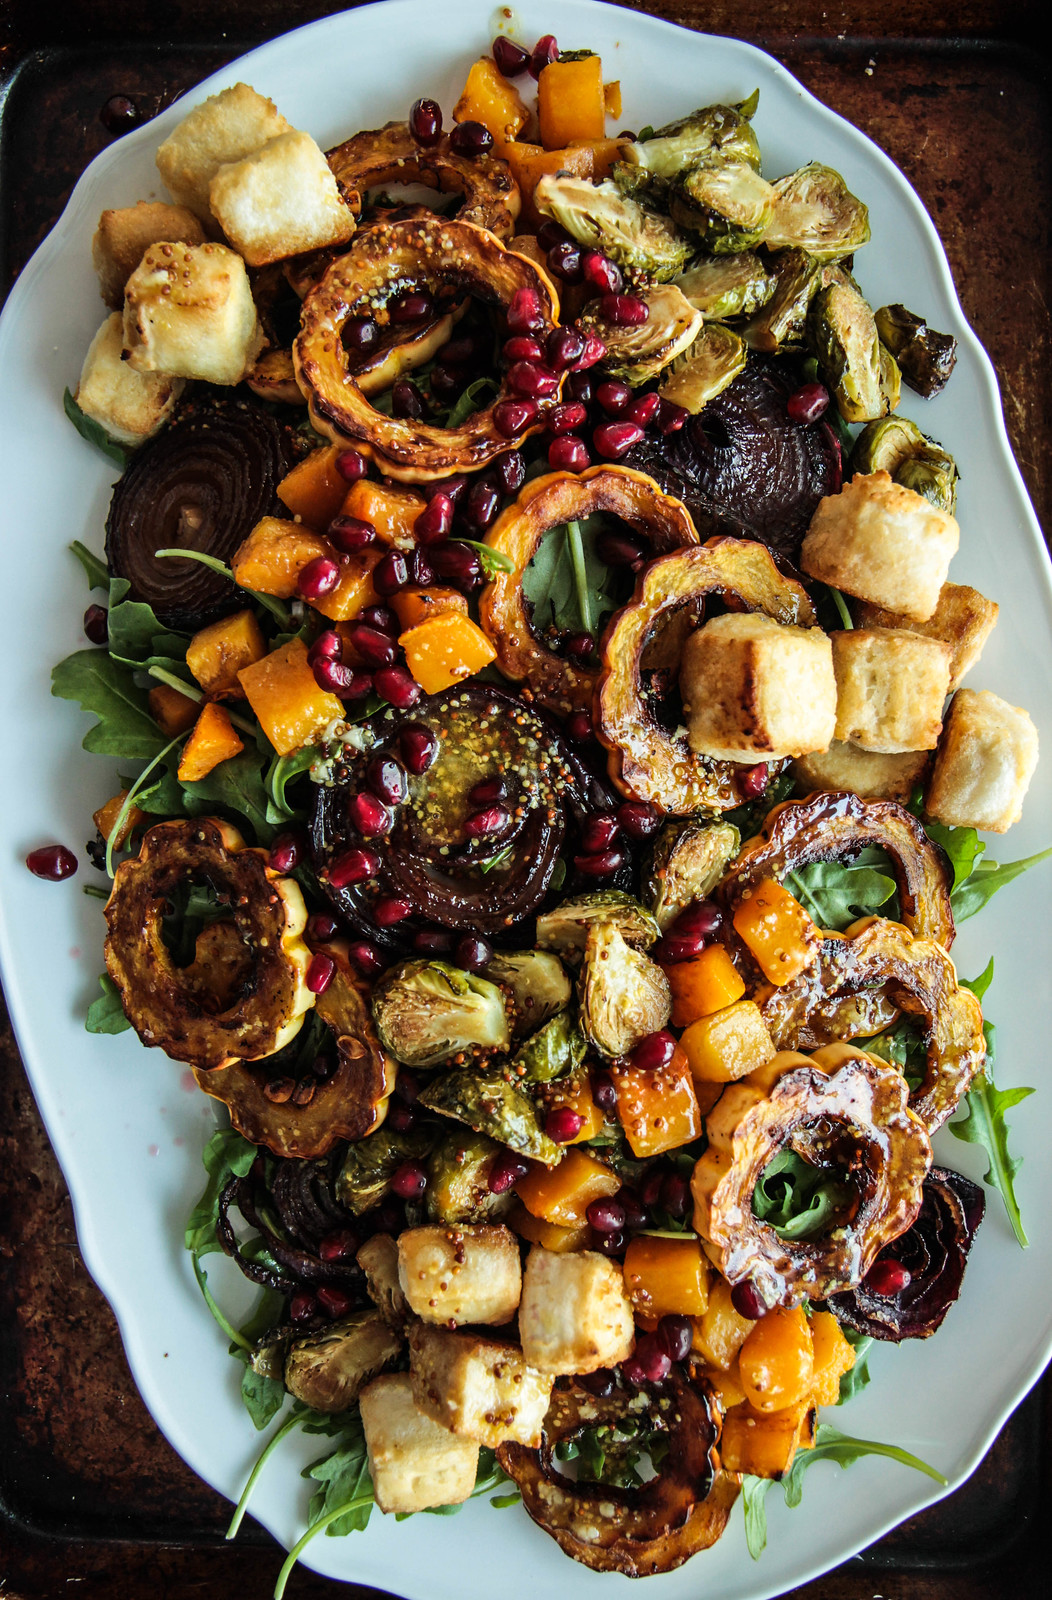 Arugula and Roasted Autumn Vegetable Salad with Crispy Tofu (Vegan and Gluten-free) from HeatherChristo.com